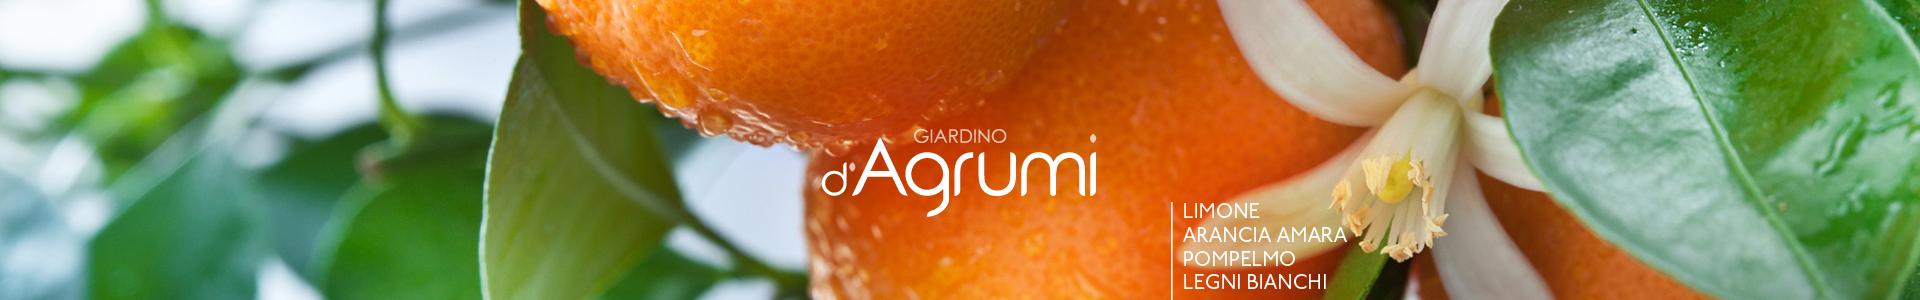 Giardino d'Agrumi